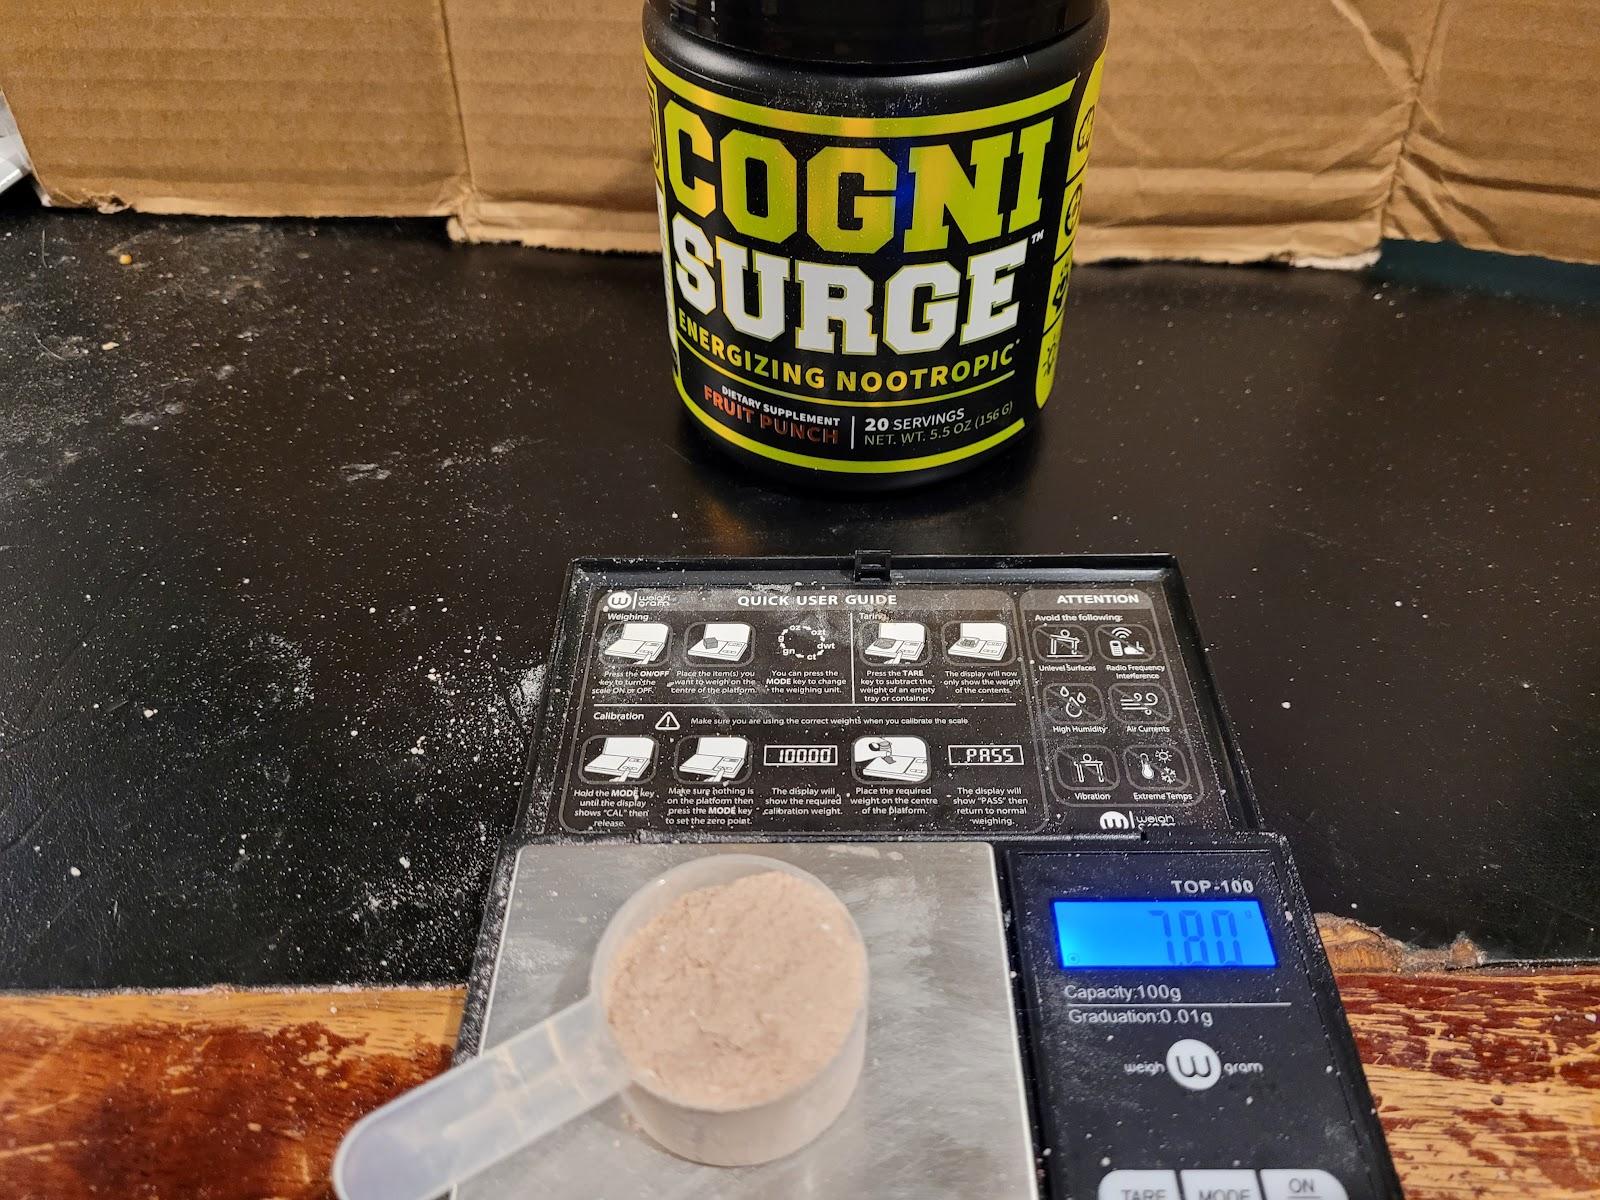 cognisurge scooper size